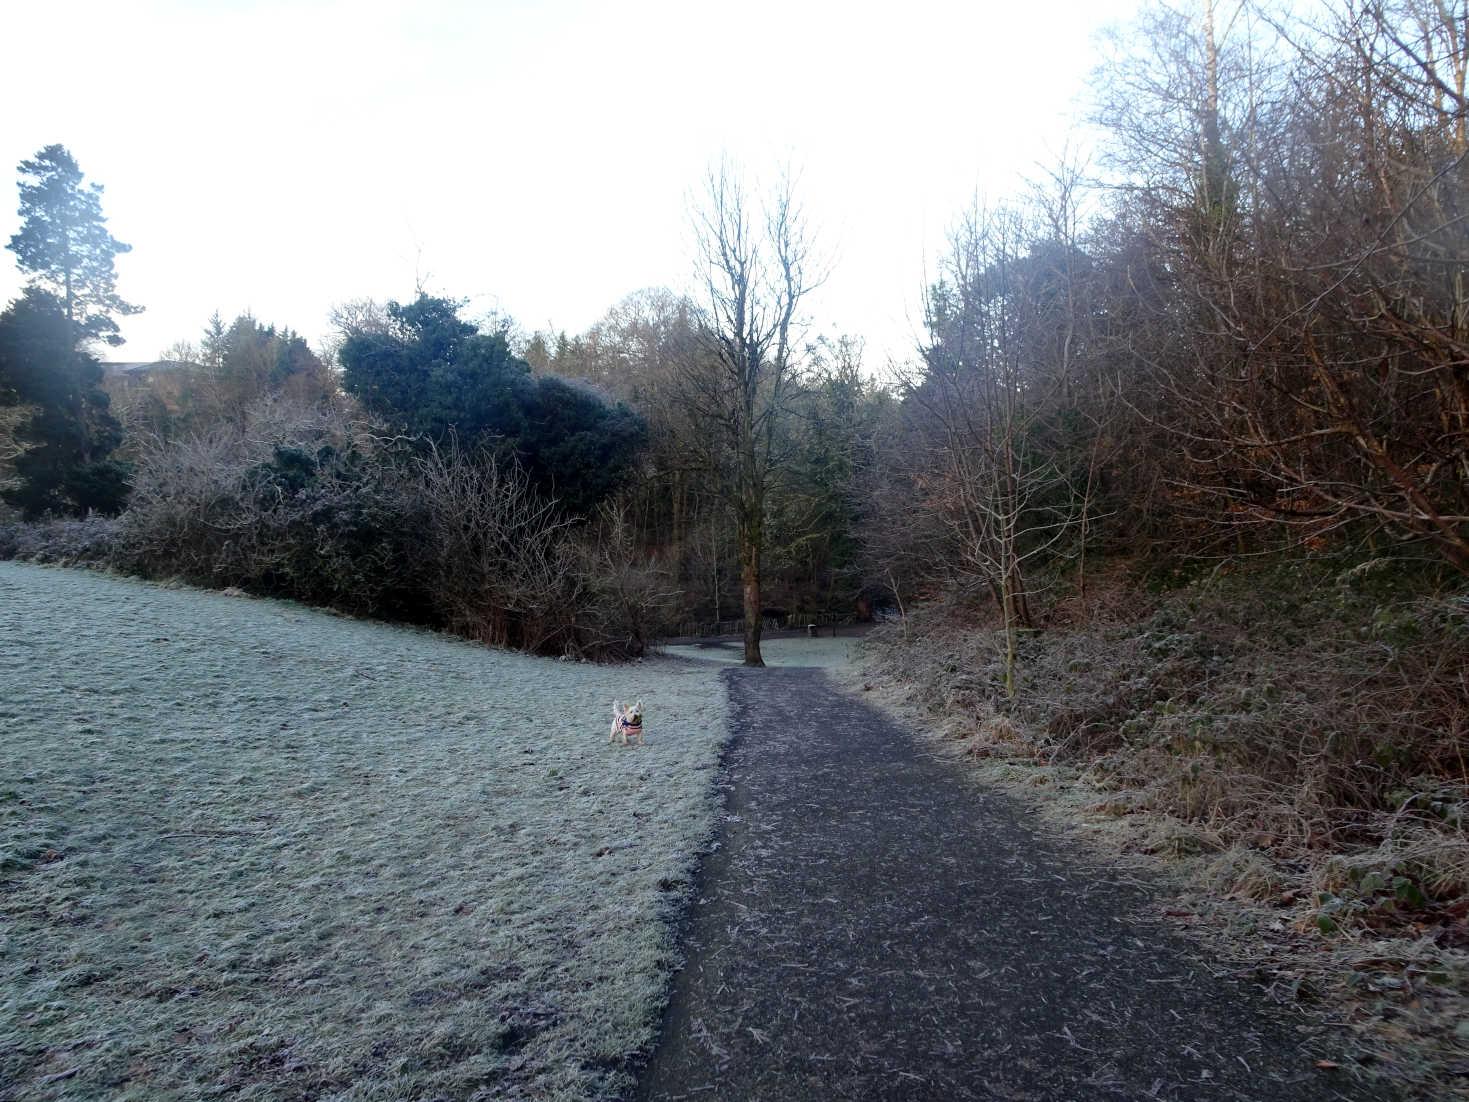 poppy the westie at start of linn park walk